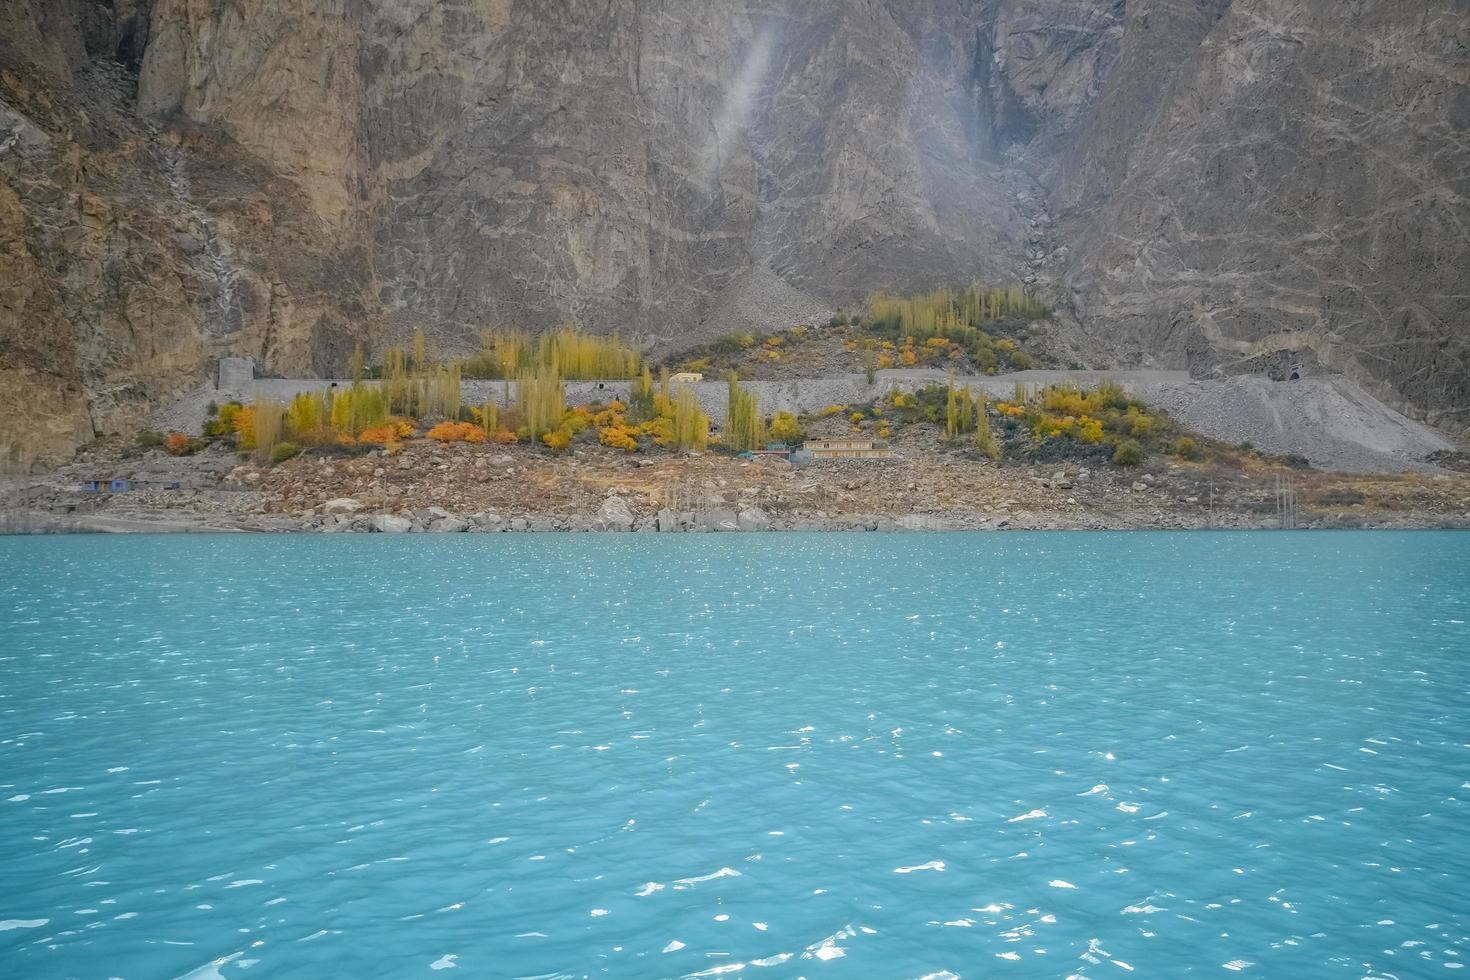 eau turquoise du lac attabad photo